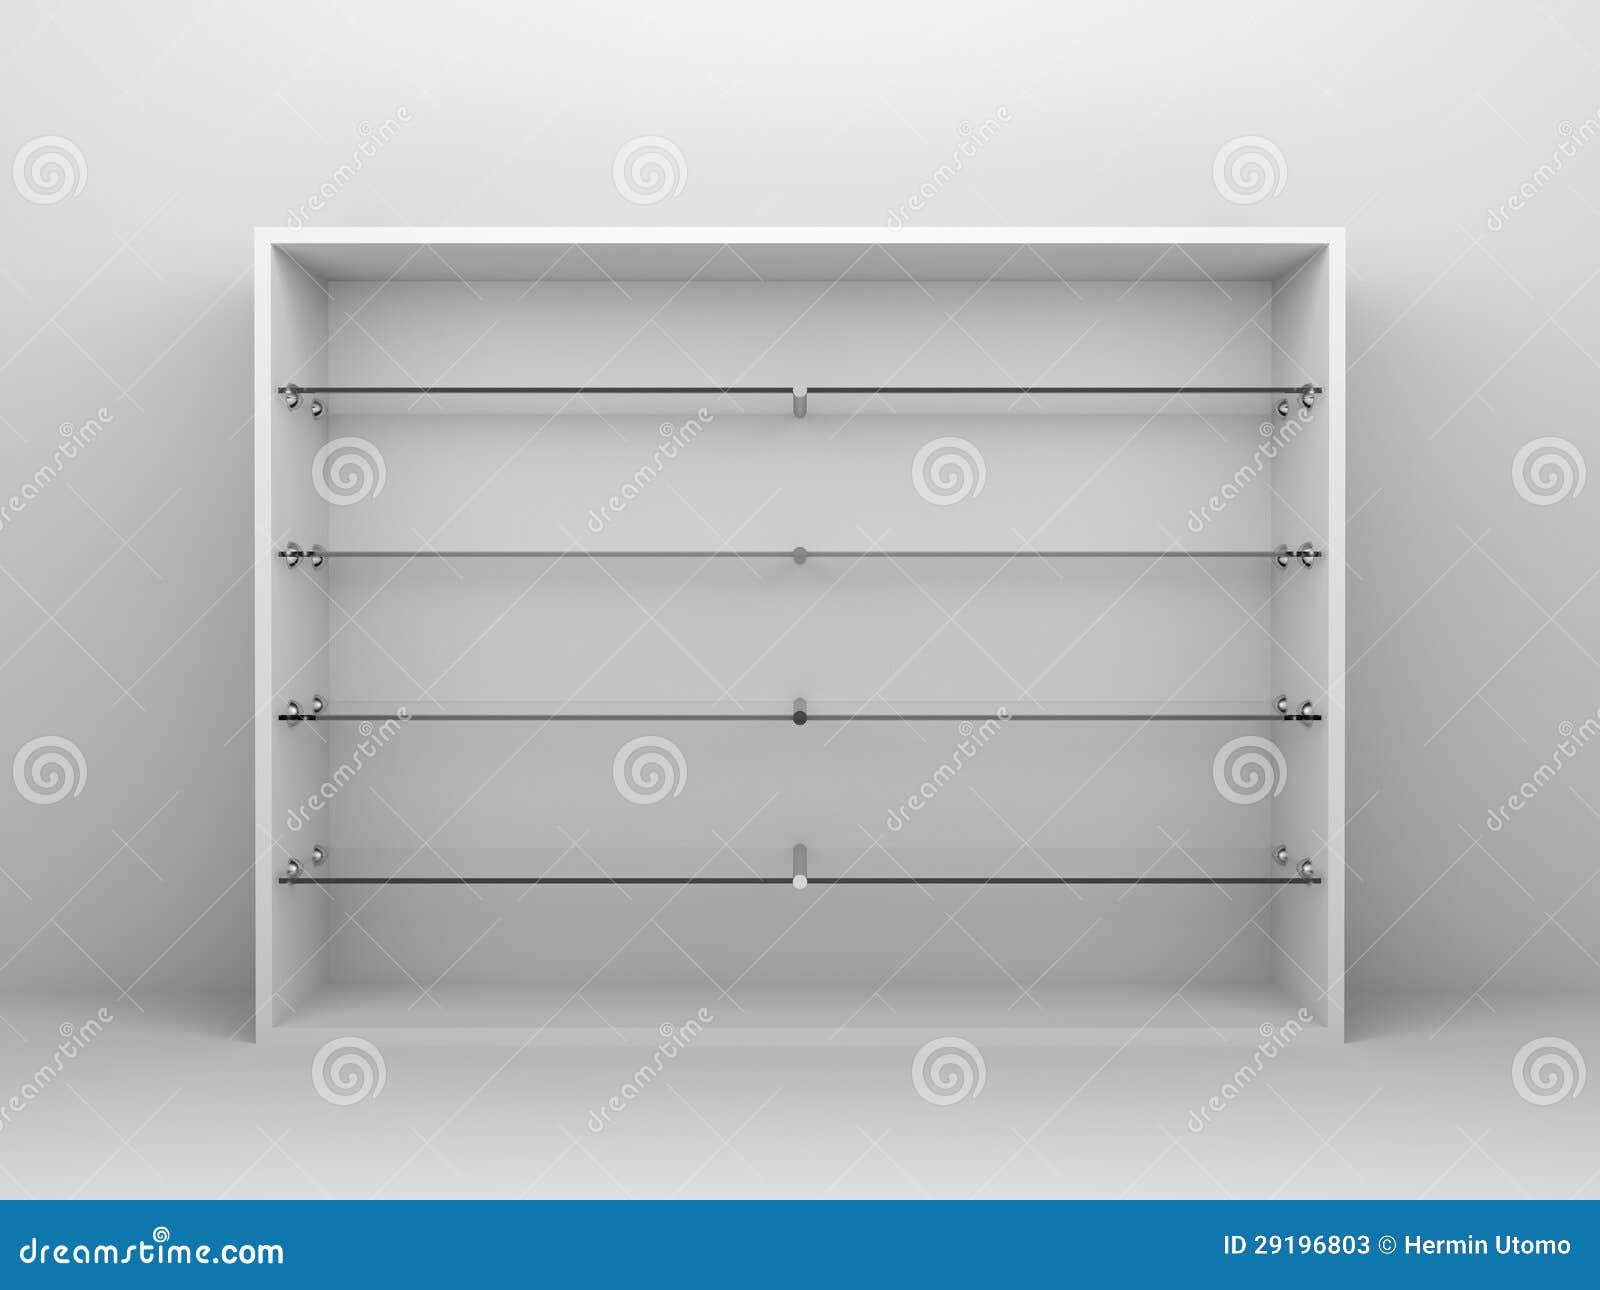 Cupboard Shelf Background Stock Photos Image 29196803